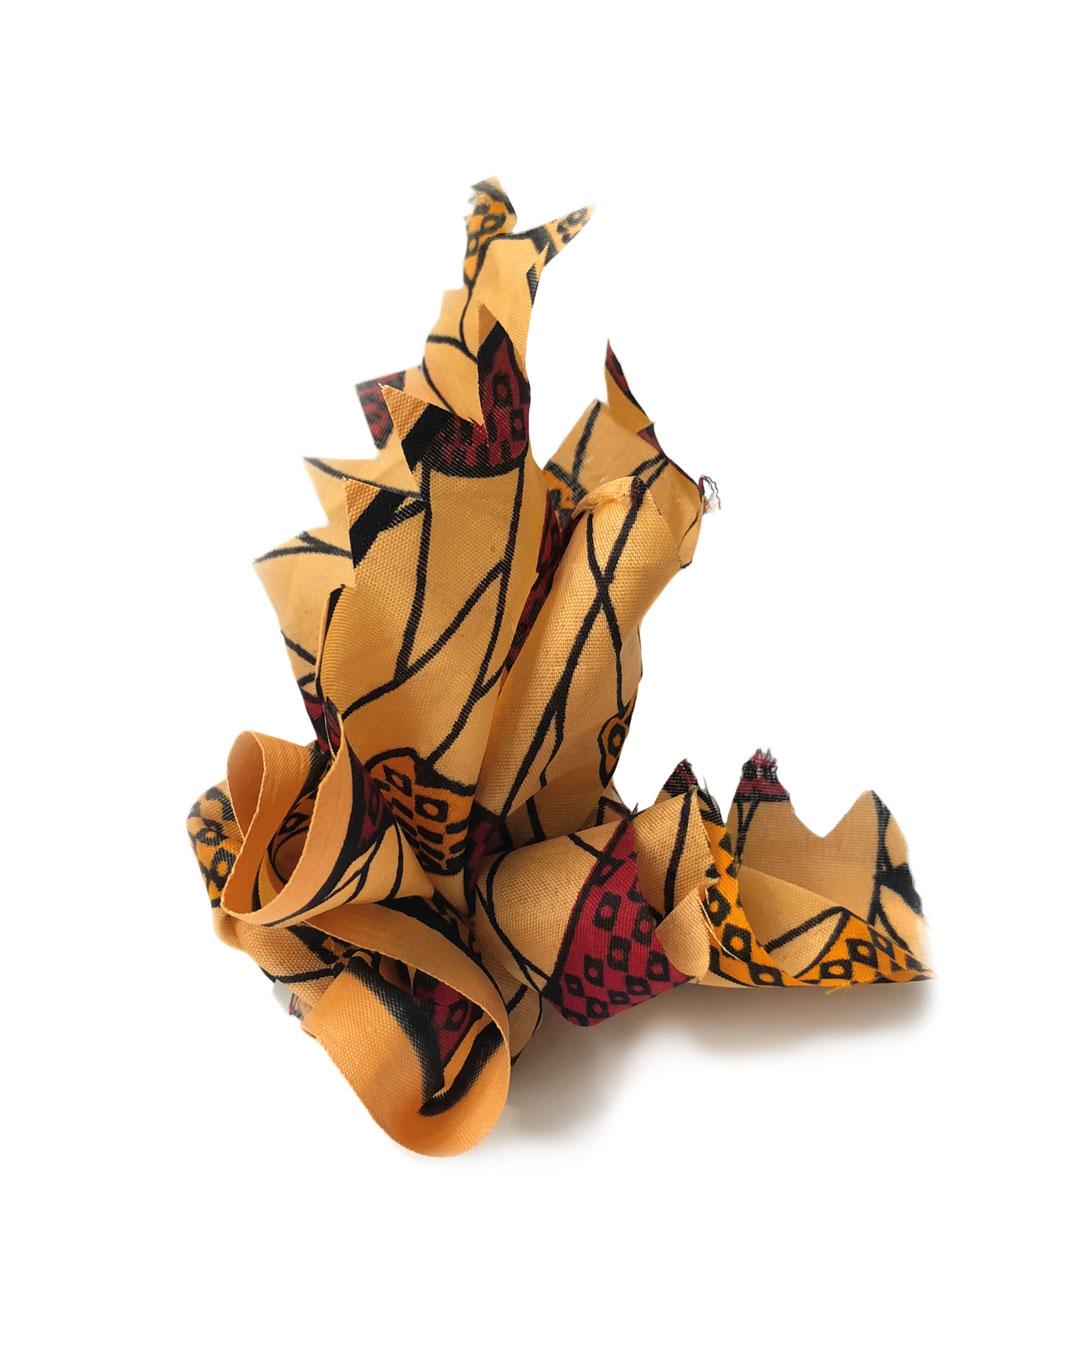 Chequita Nahar, Angisa, 2017, brooch; silver, cotton, 120 x 130.5 x 100 mm, €330